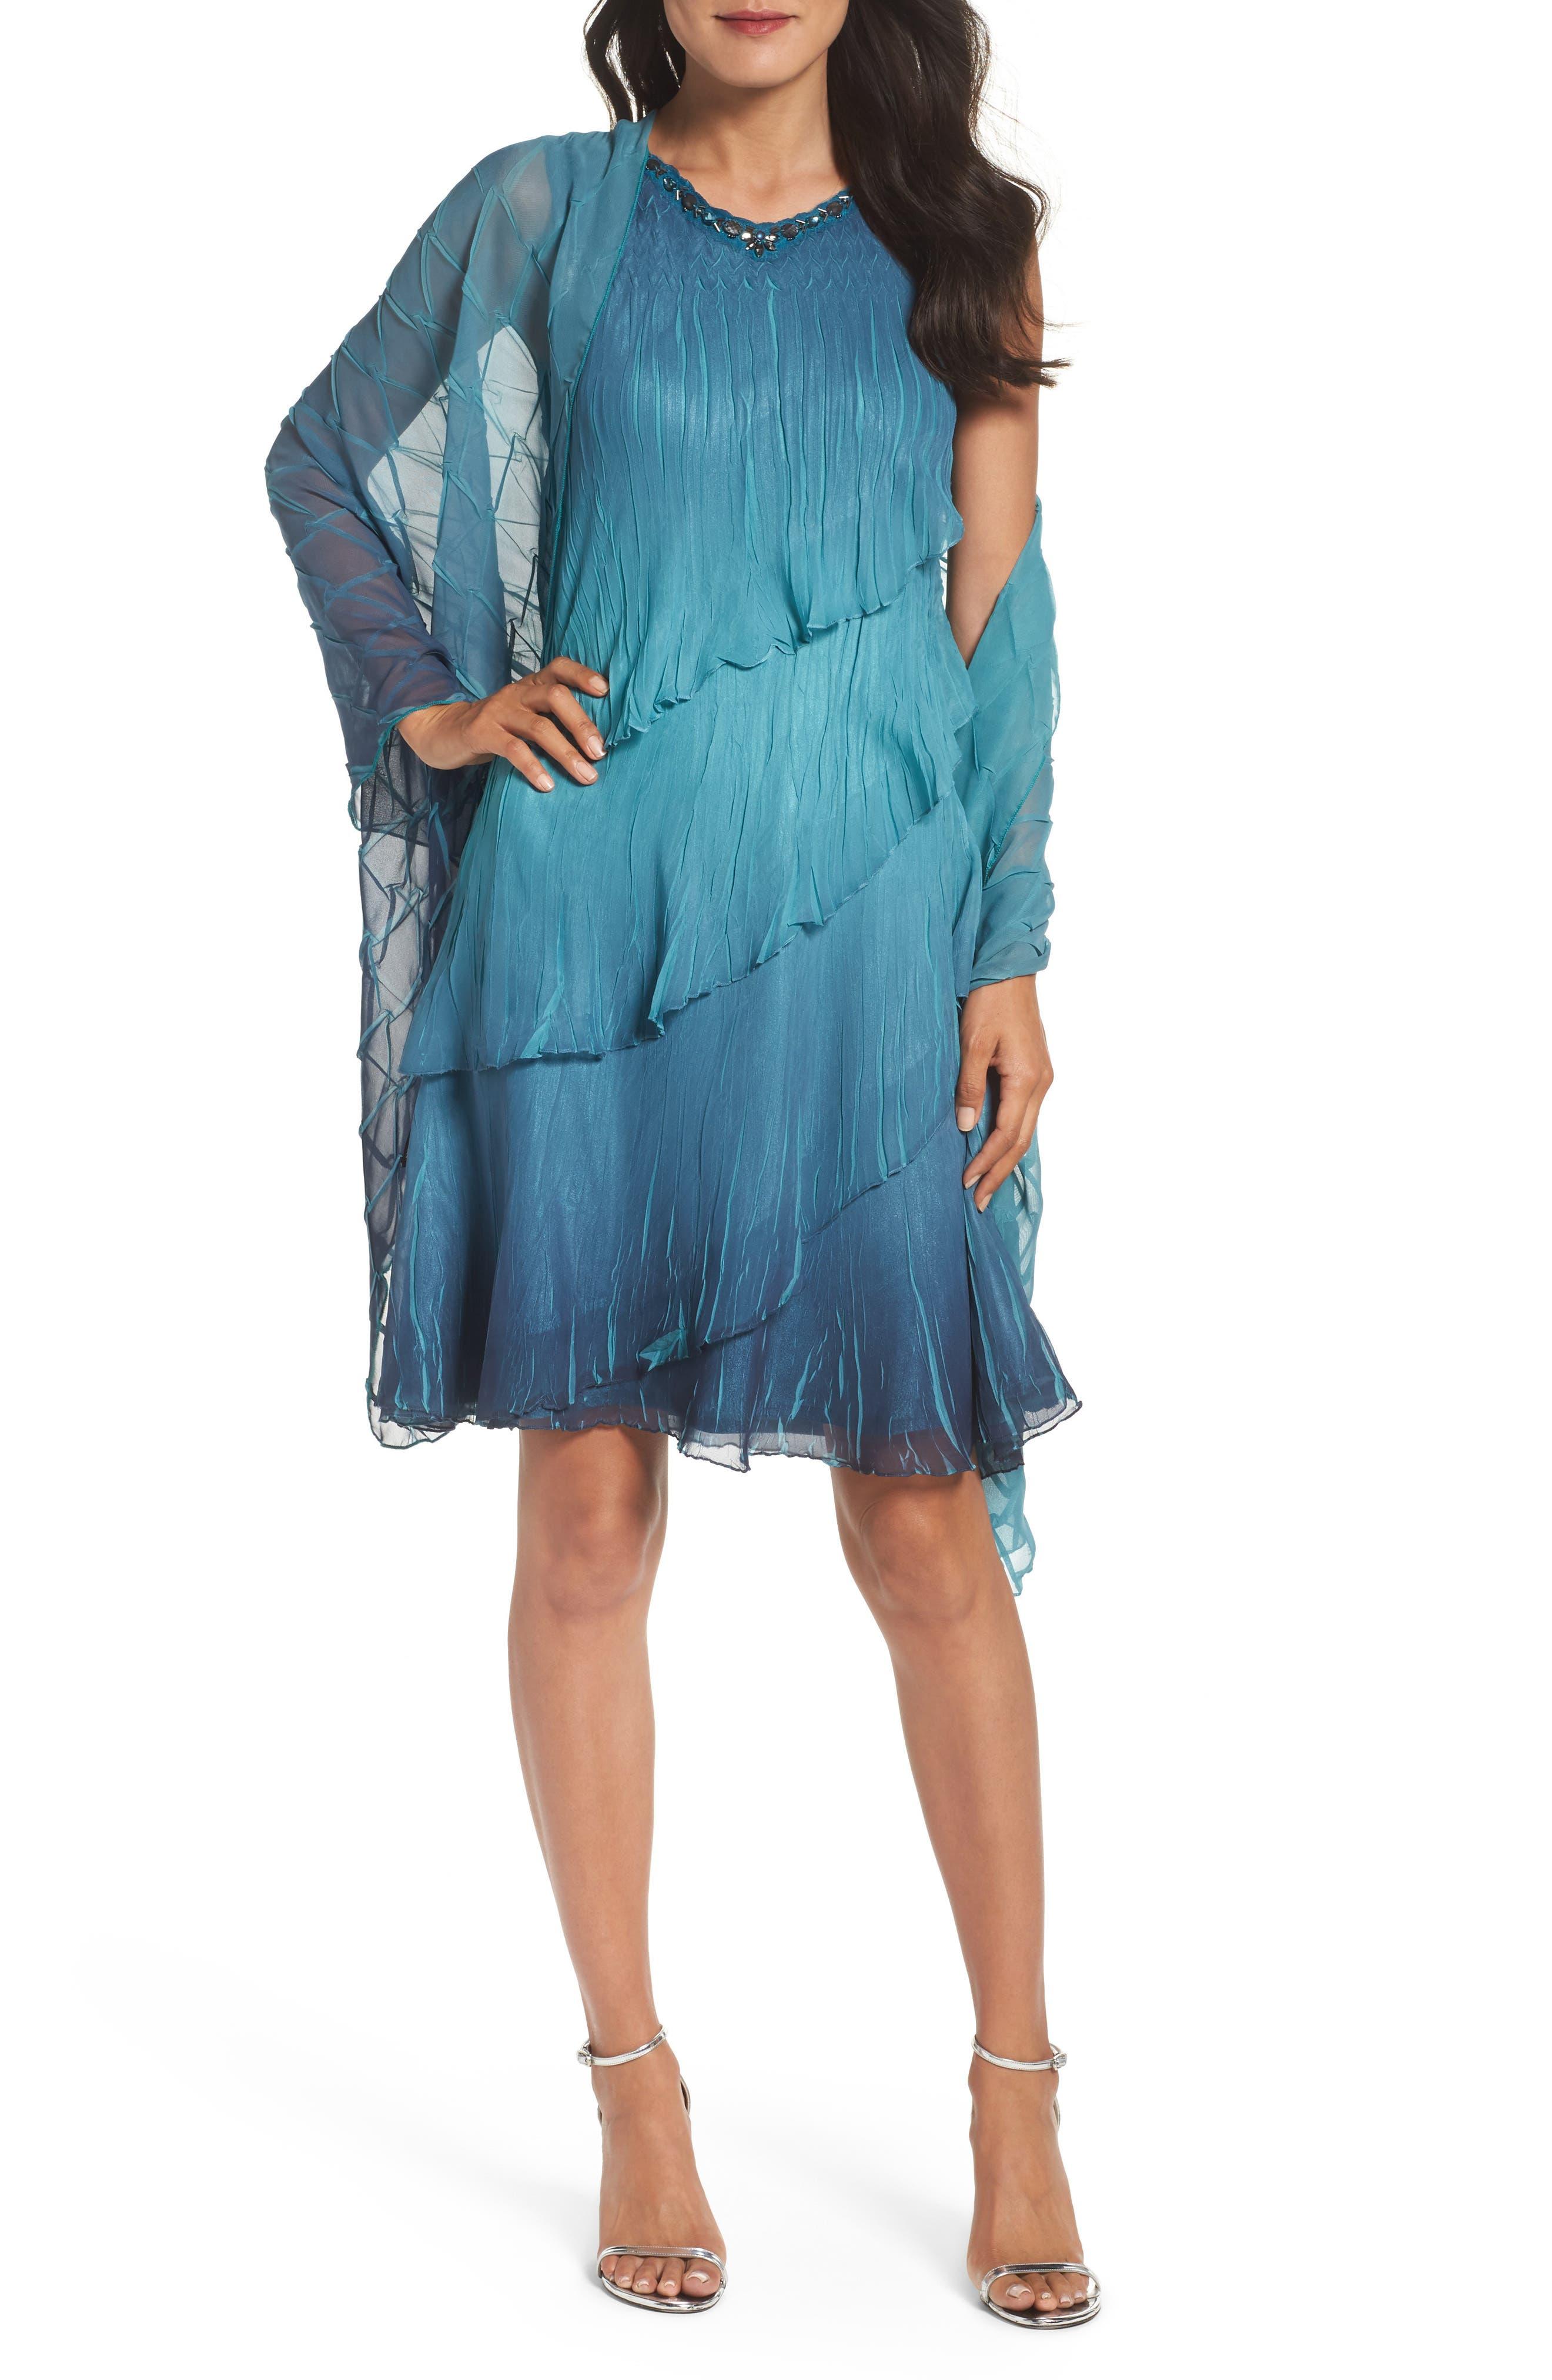 Tiered Chiffon Shift Dress with Shawl,                         Main,                         color, 491